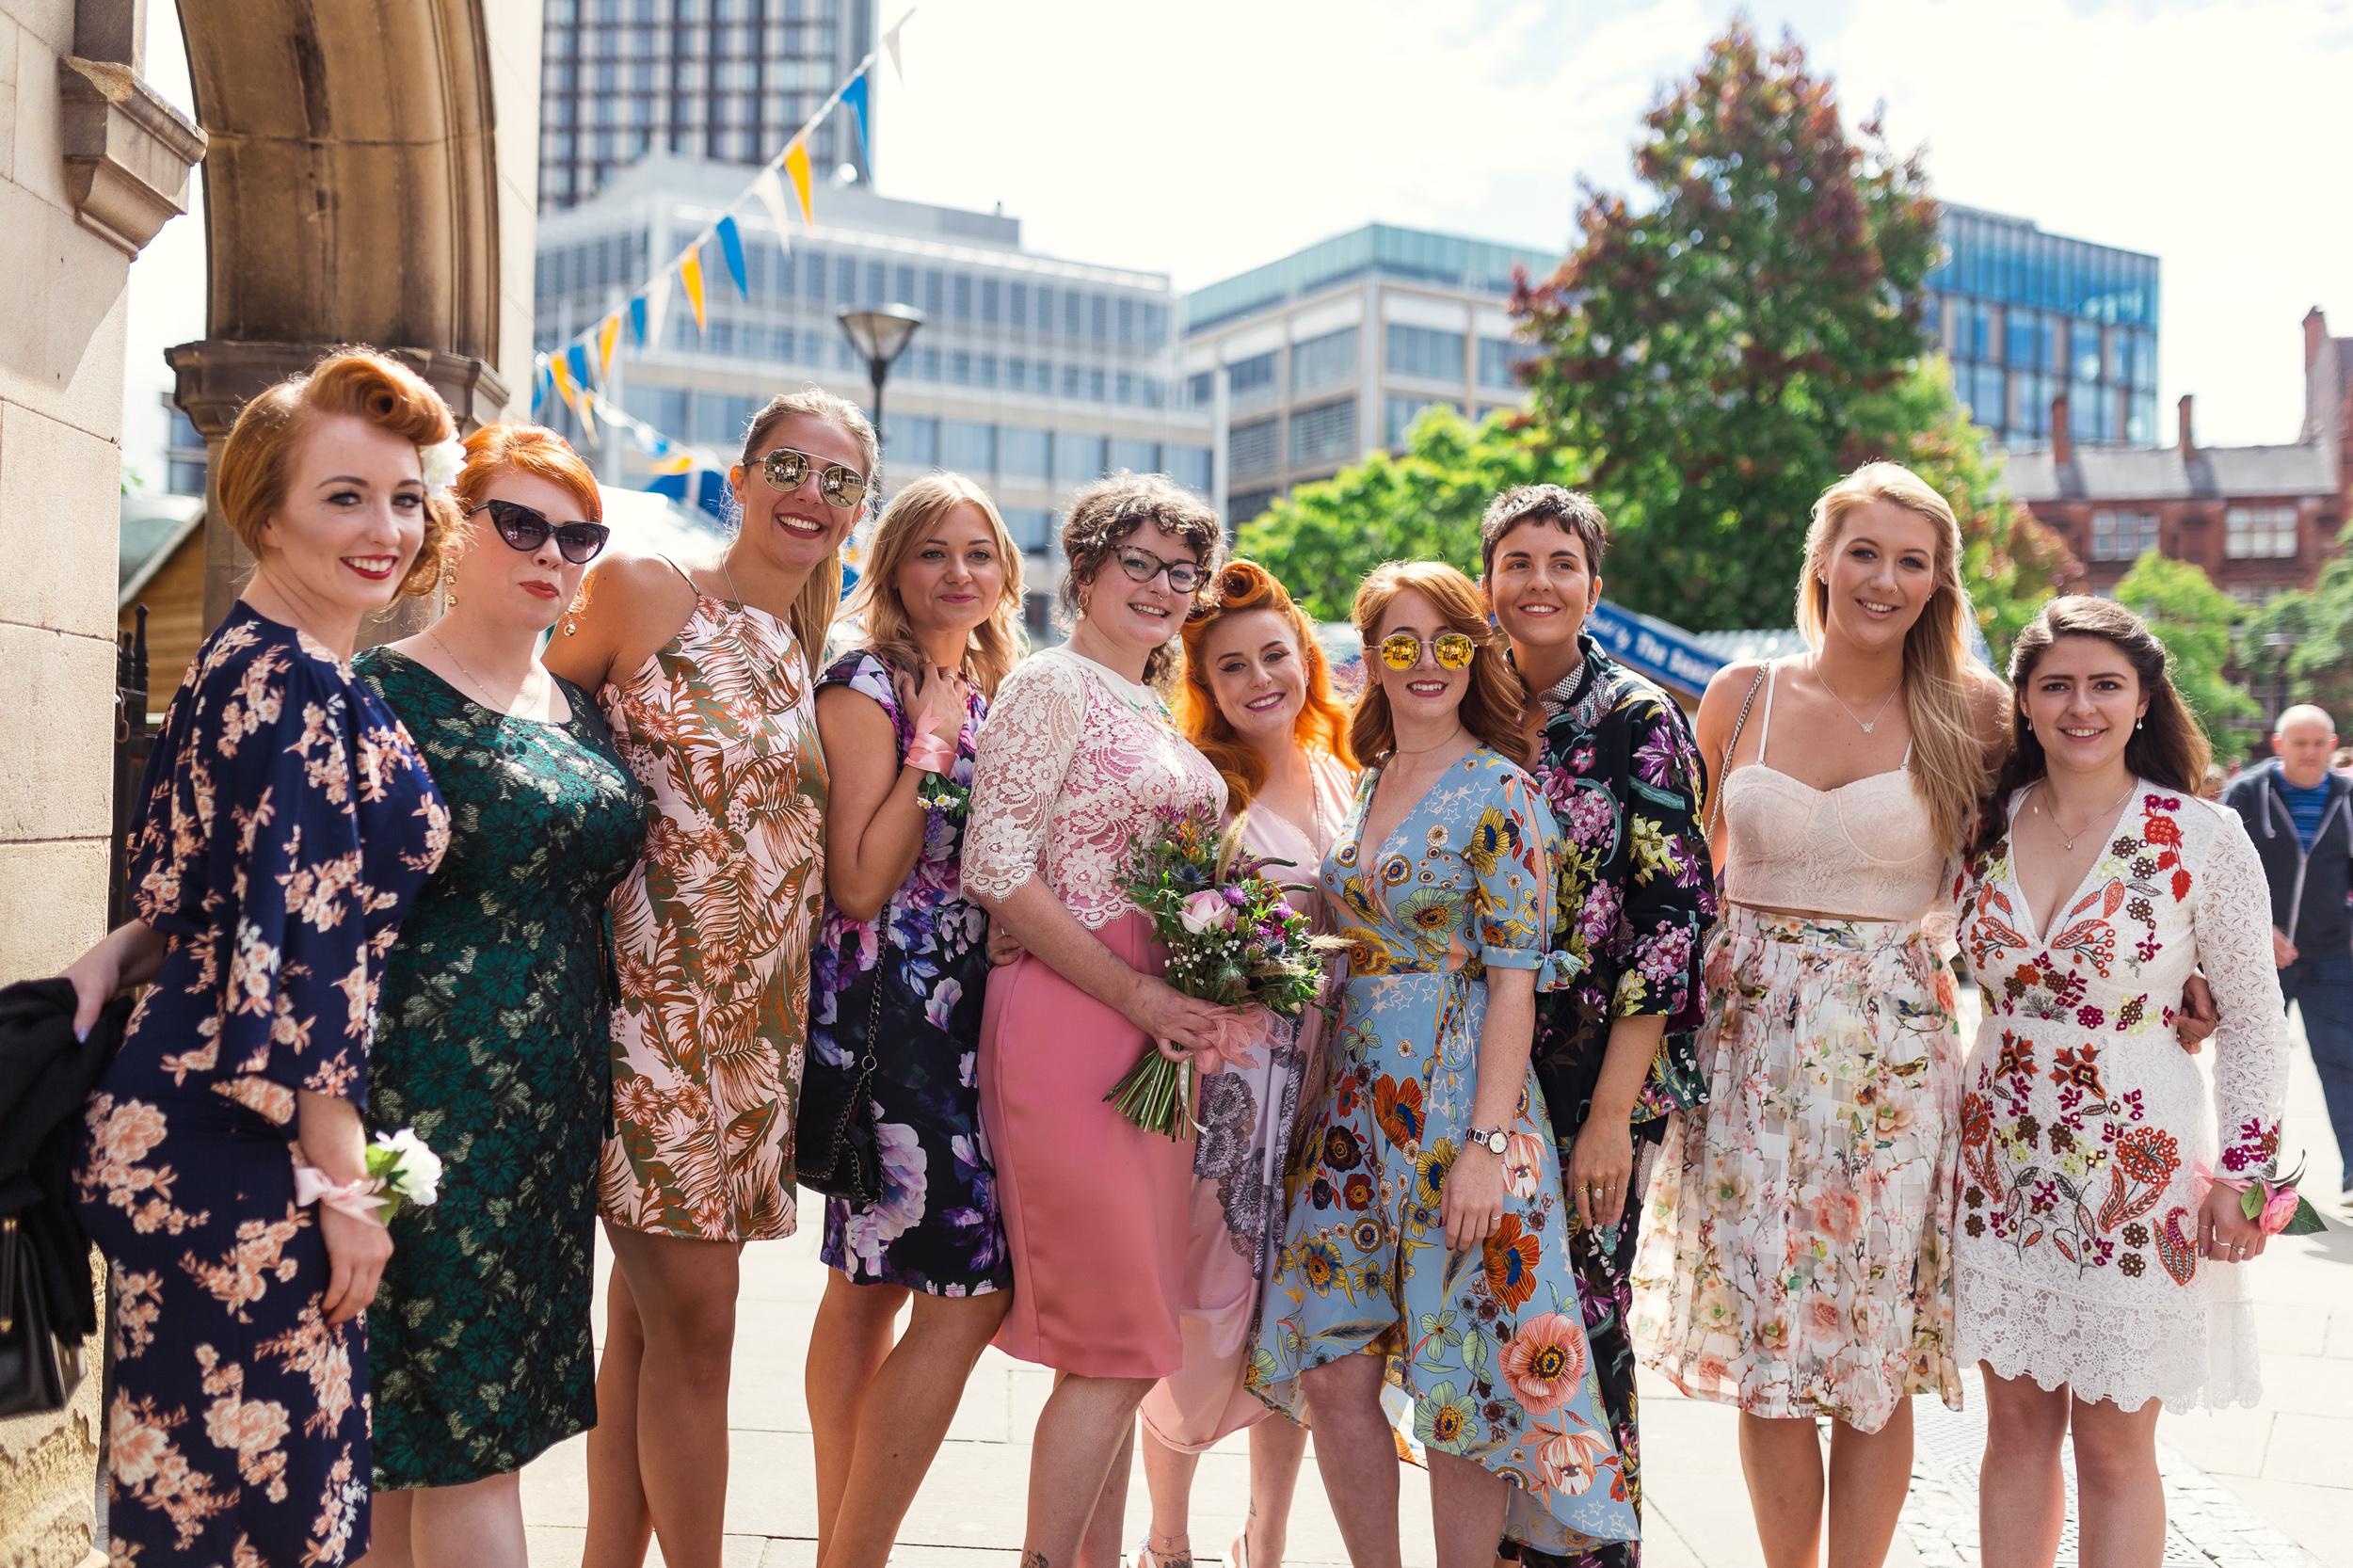 Emma-Coloured-Wedding-Dress-Sheffield-Kate-Beaumont-13.jpg